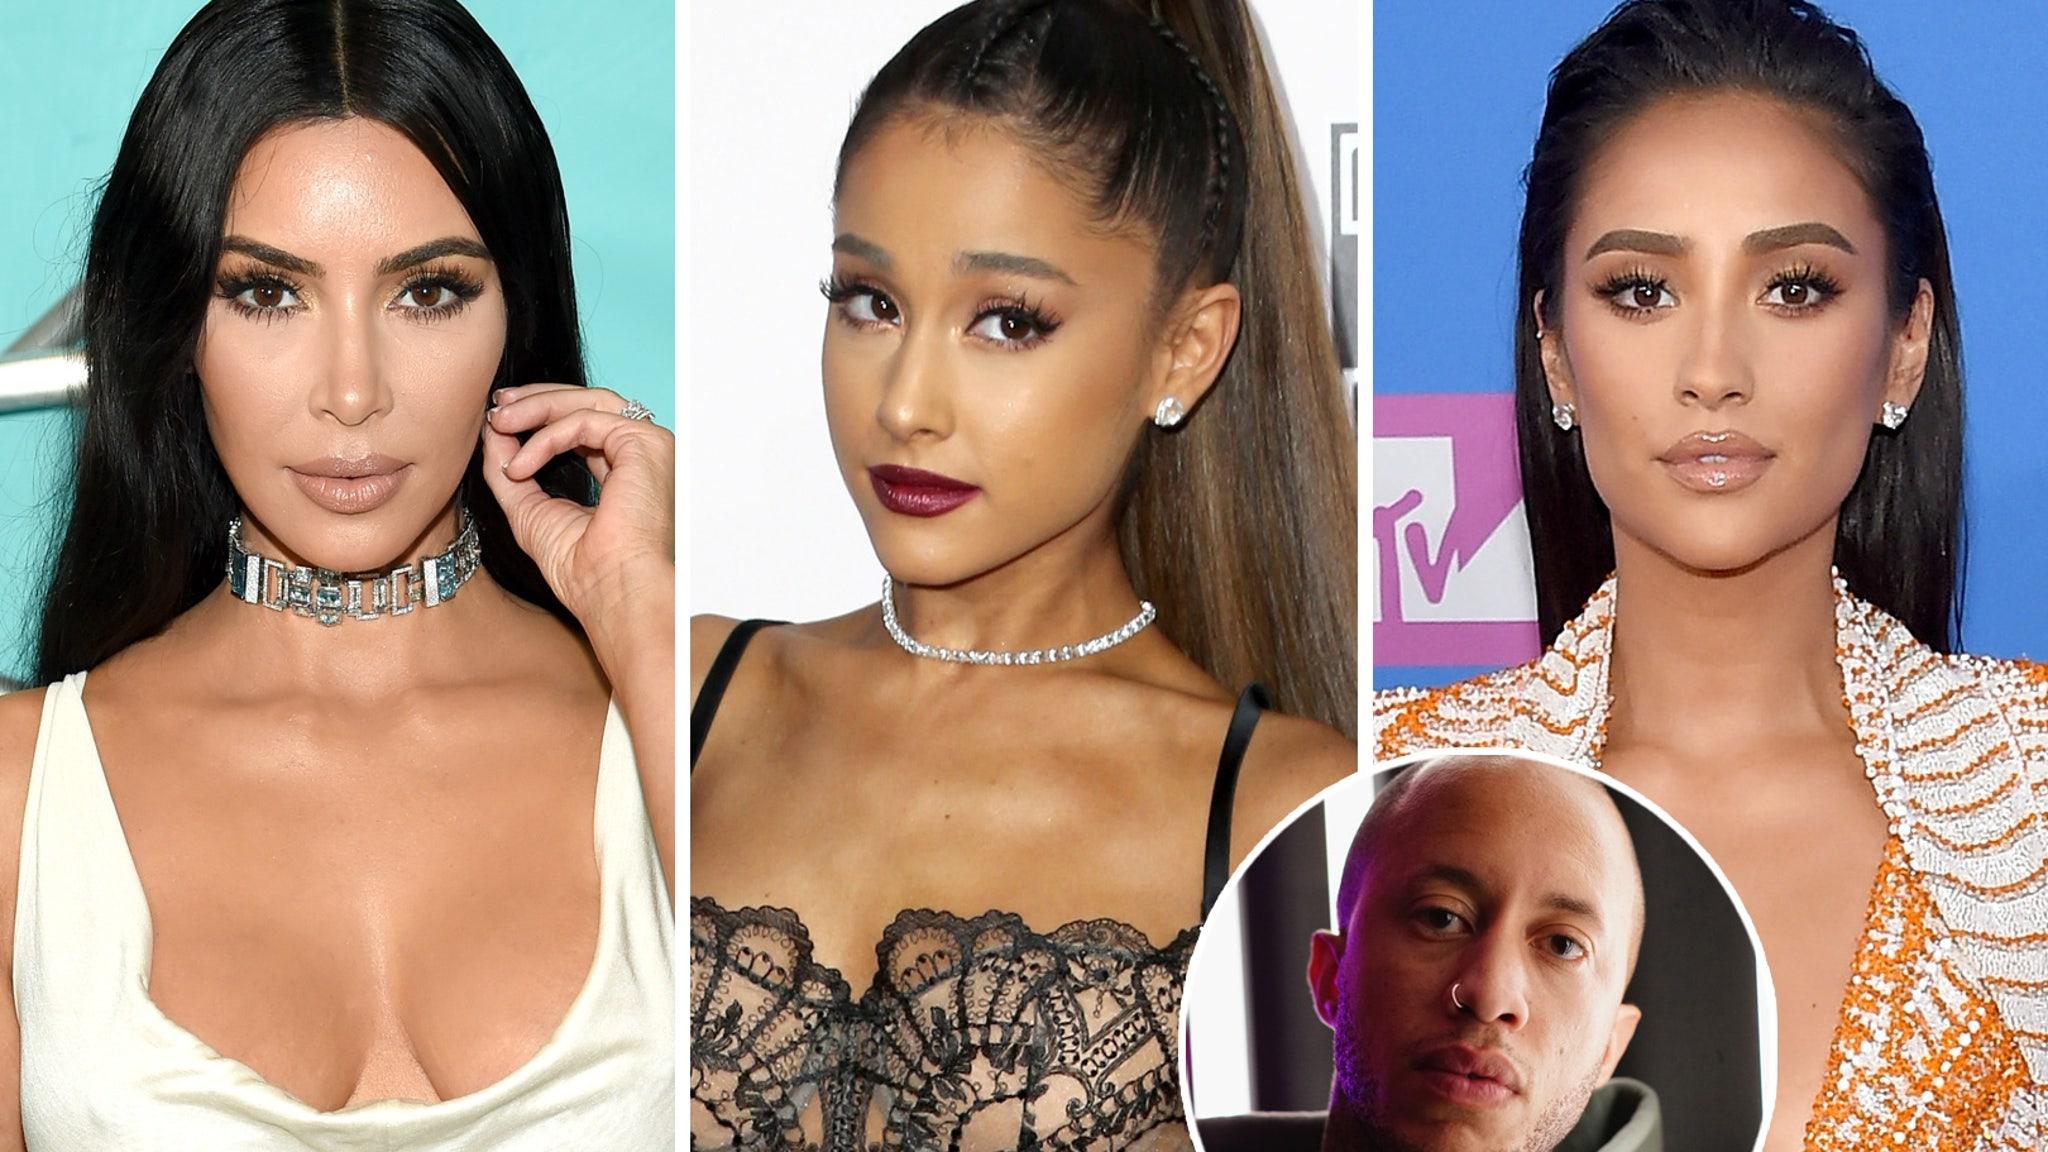 Ariana Grande And Kim Kardashian Speak Out Following